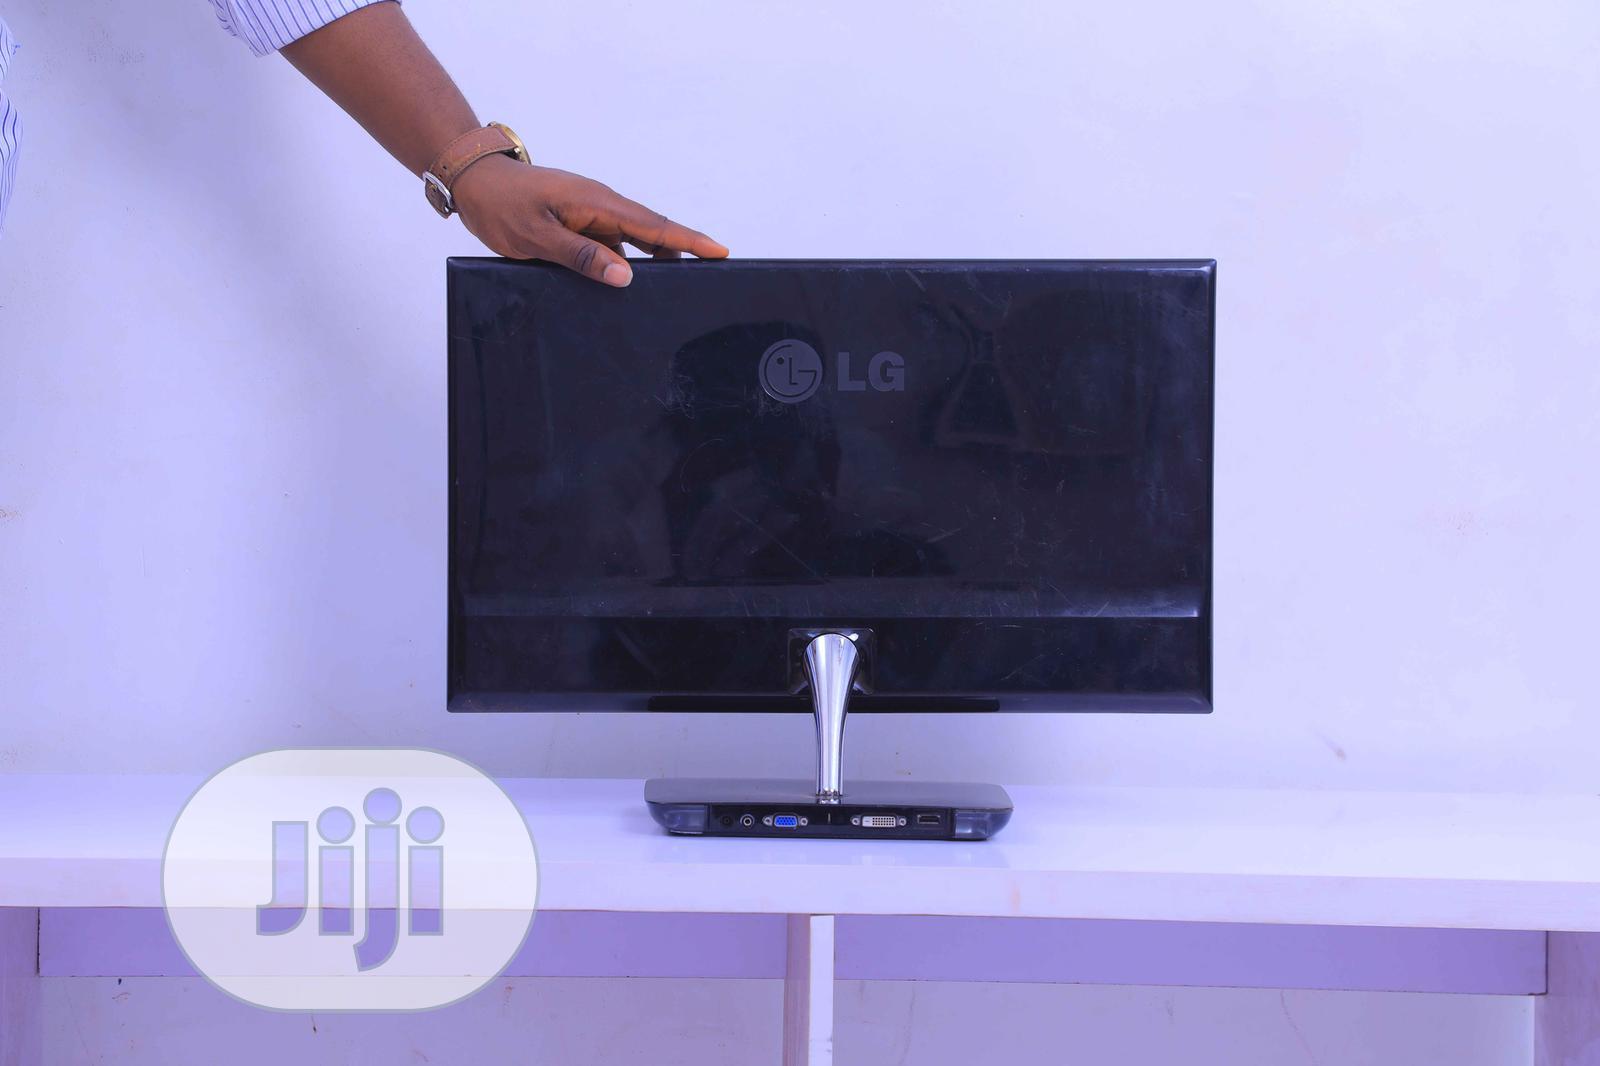 LG E2381VR-BN - LED Monitor - Full HD (1080p) | Computer Monitors for sale in Enugu, Enugu State, Nigeria